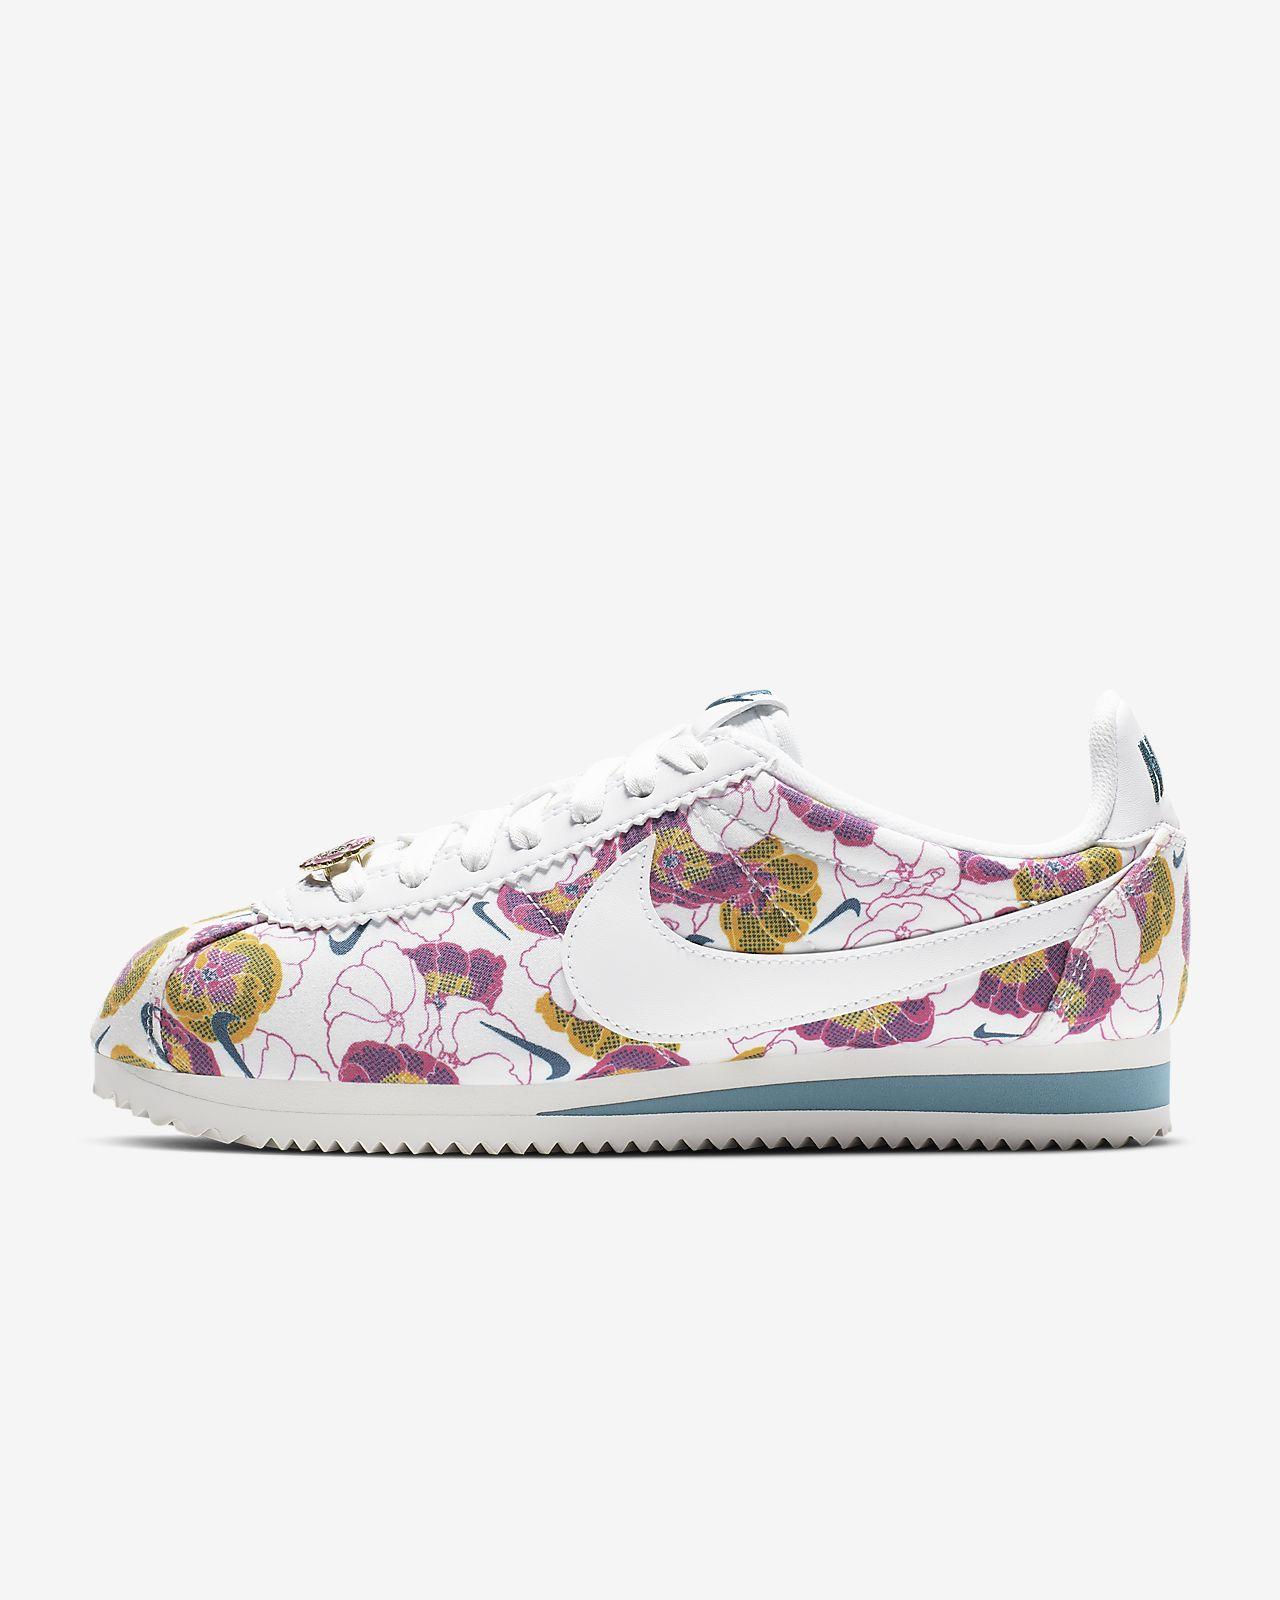 Nike Classic Cortez LX Floral Women\u0027s Shoe